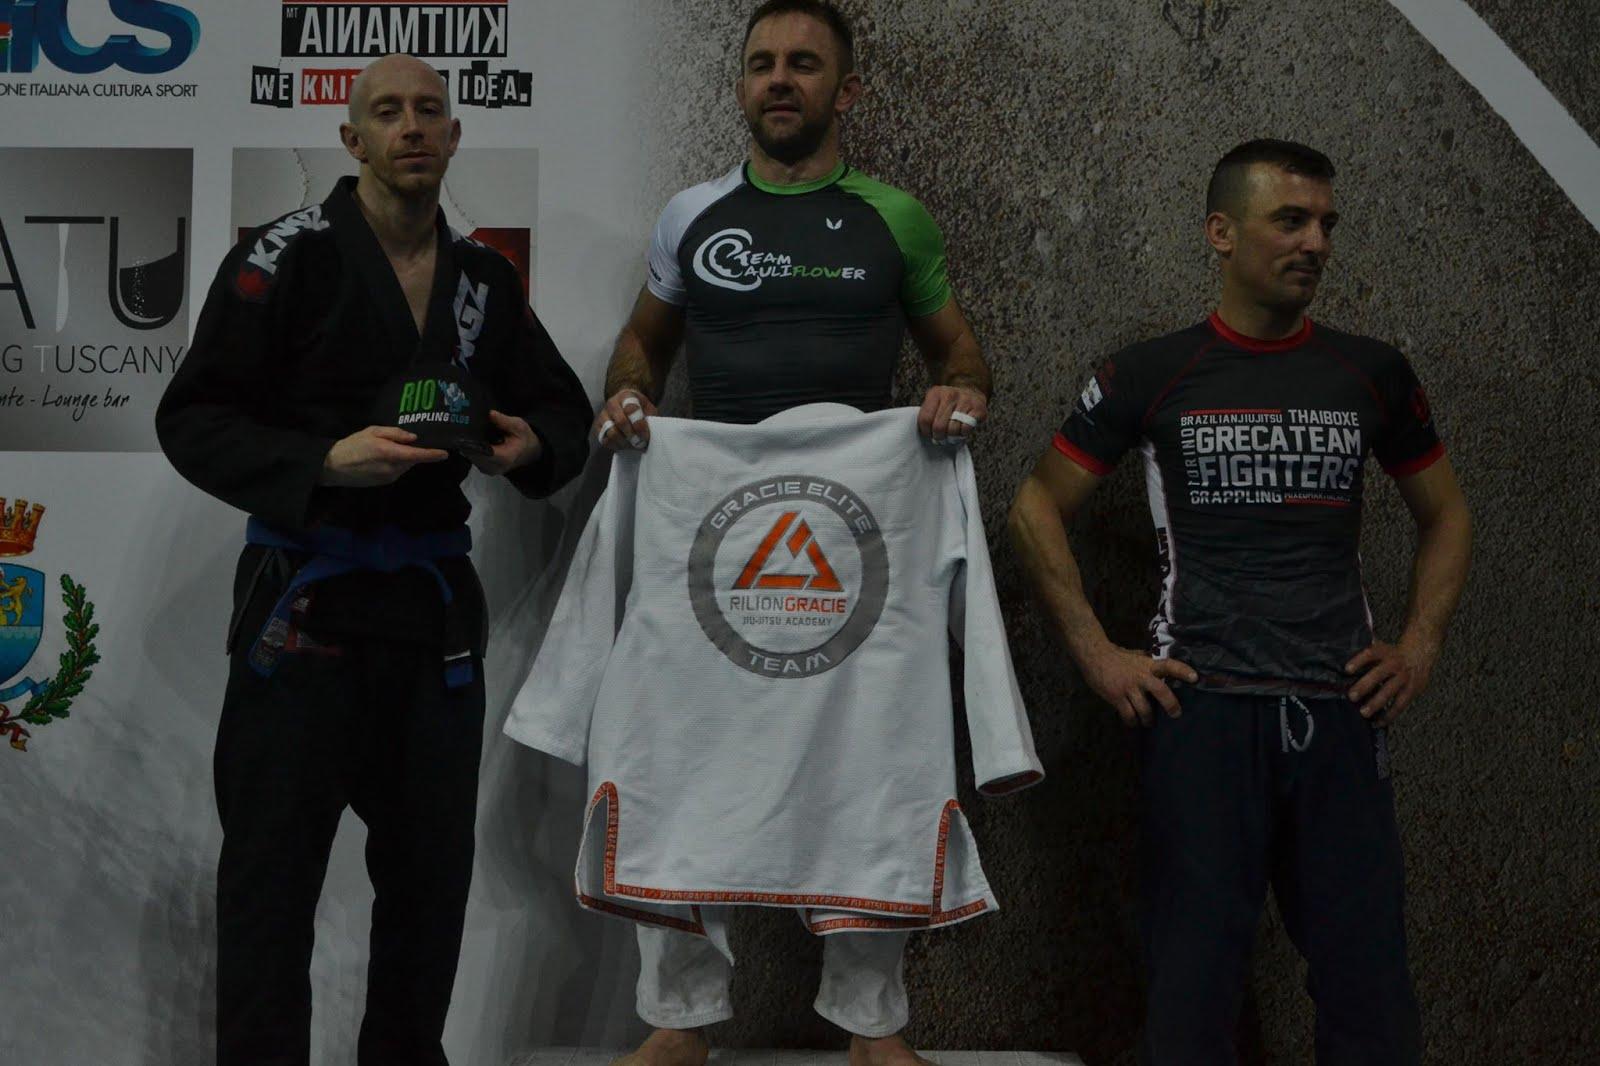 perdere peso per il torneo jiu jitsu